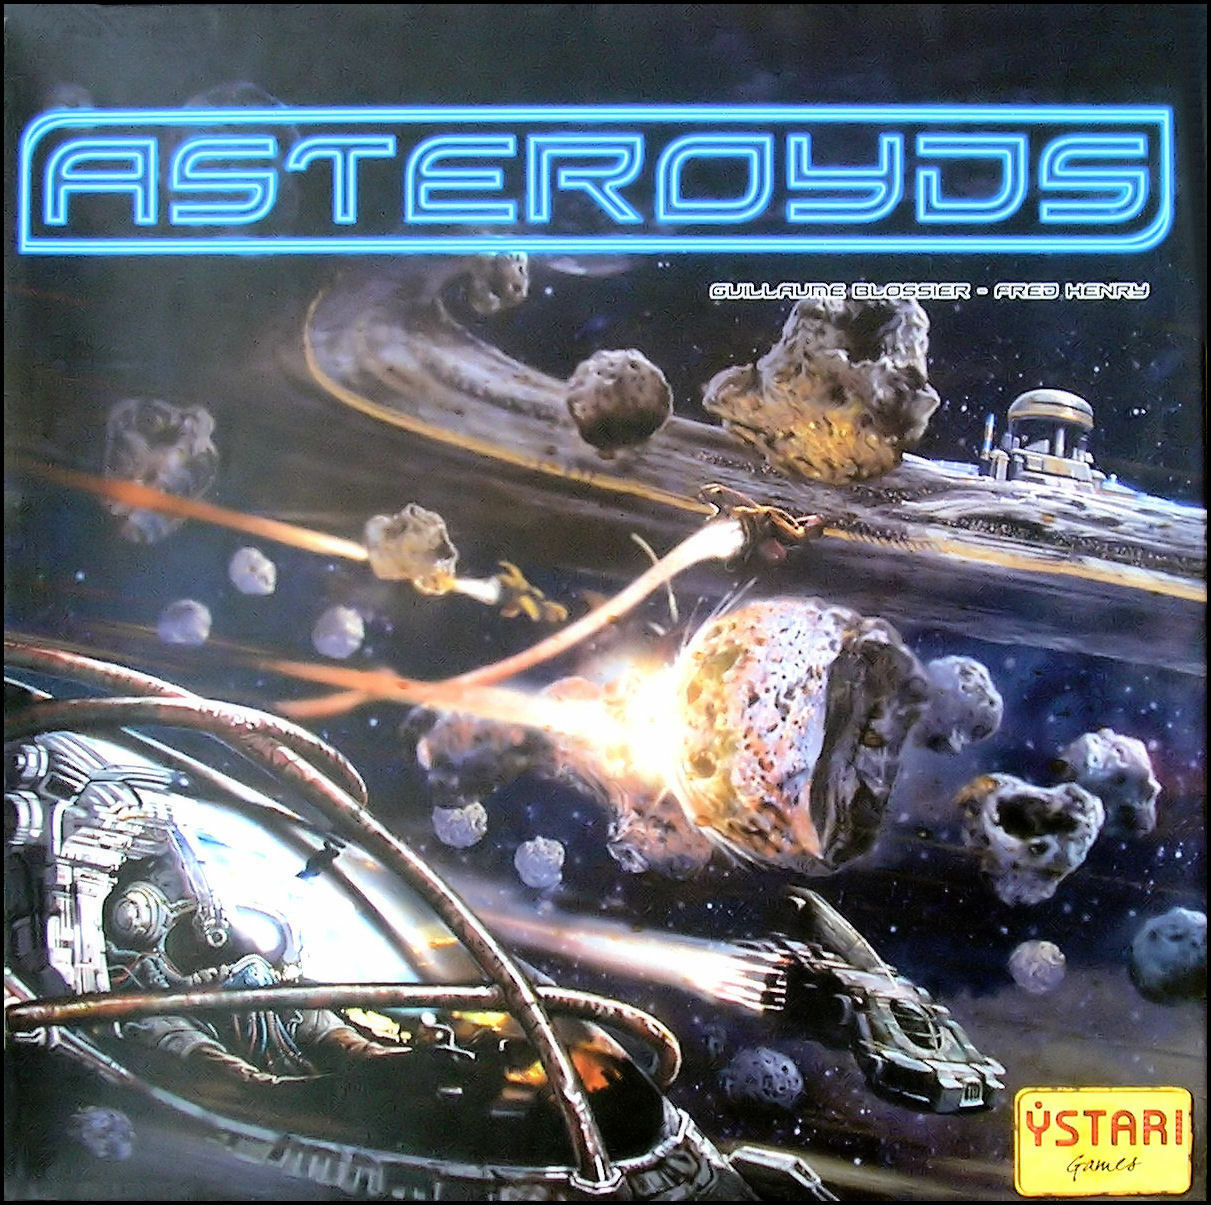 Jeu de société Asteroyds - Ystari - Neuf, emballé - - - 8da020